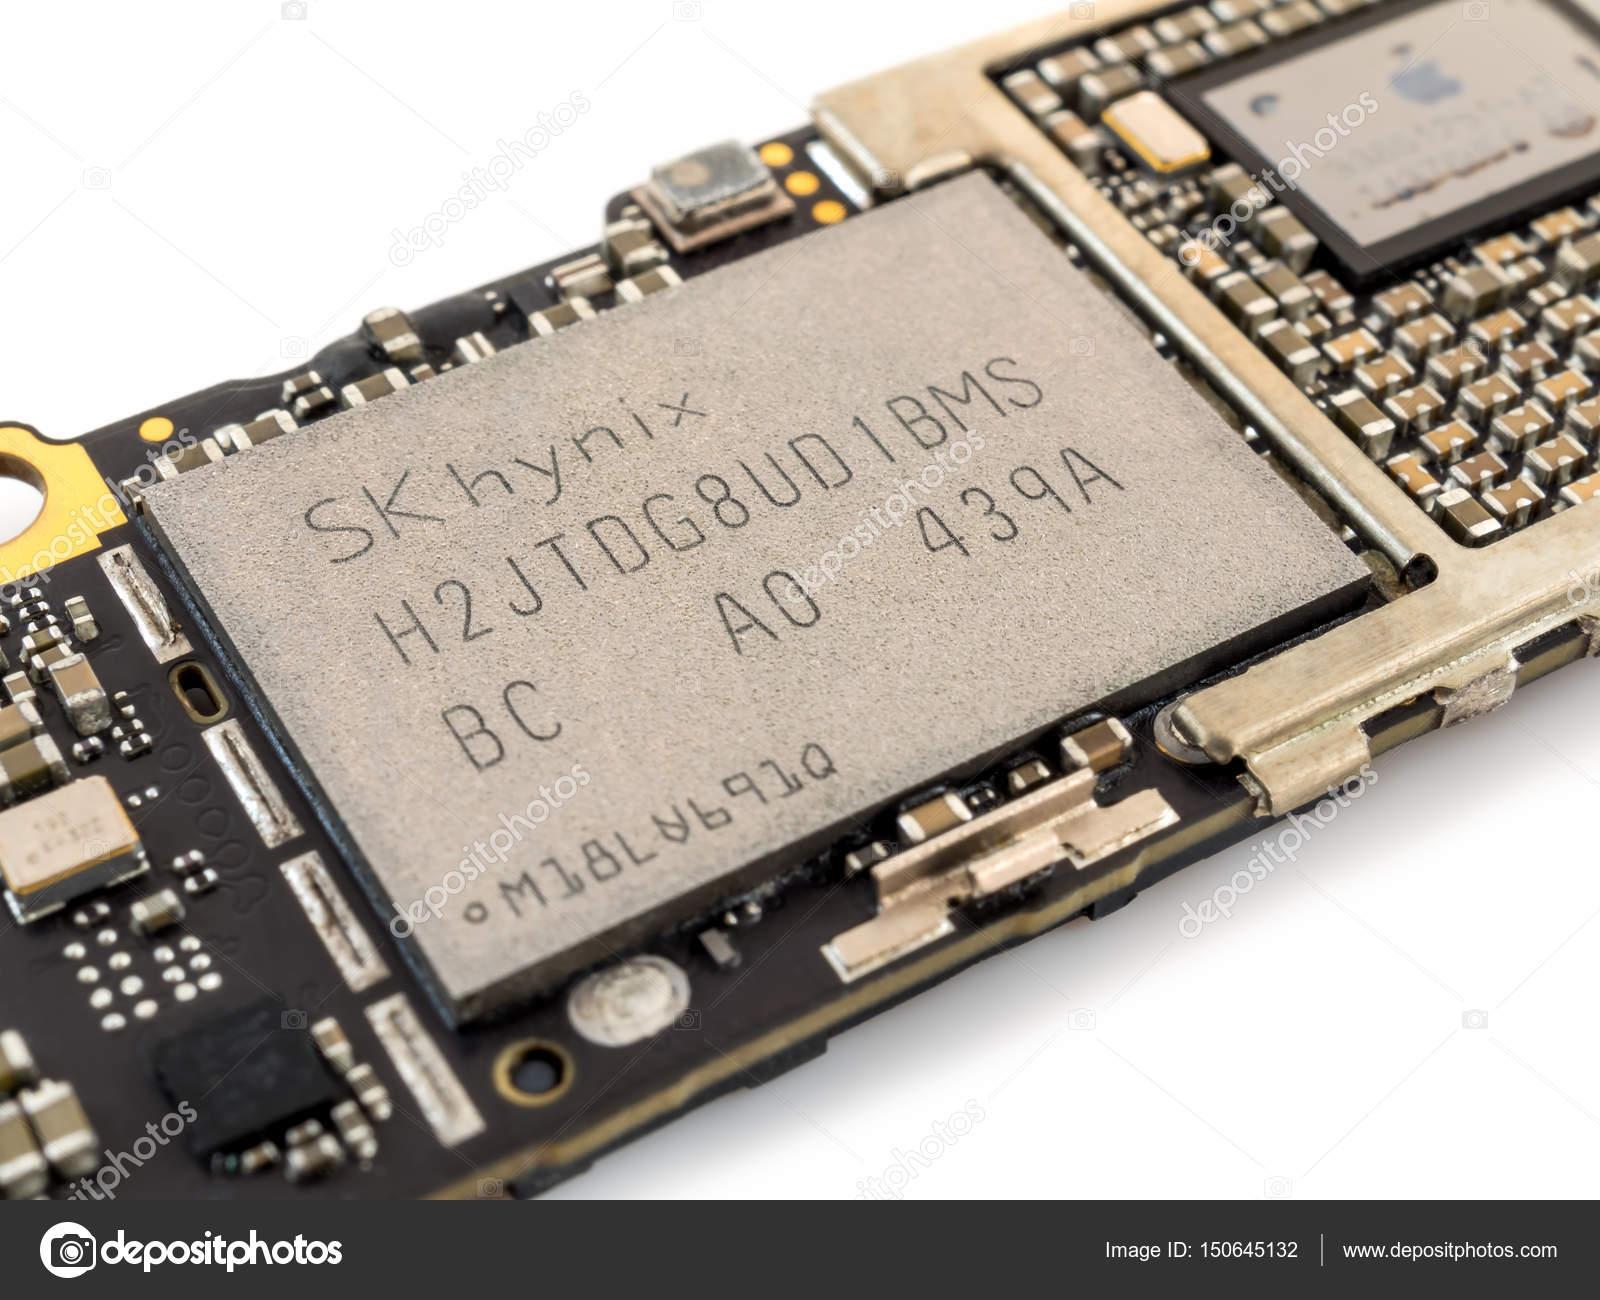 Apple Iphone 6 Nand Flash Ic Chip Stock Editorial Photo Poravute Siriphiroon 150645132